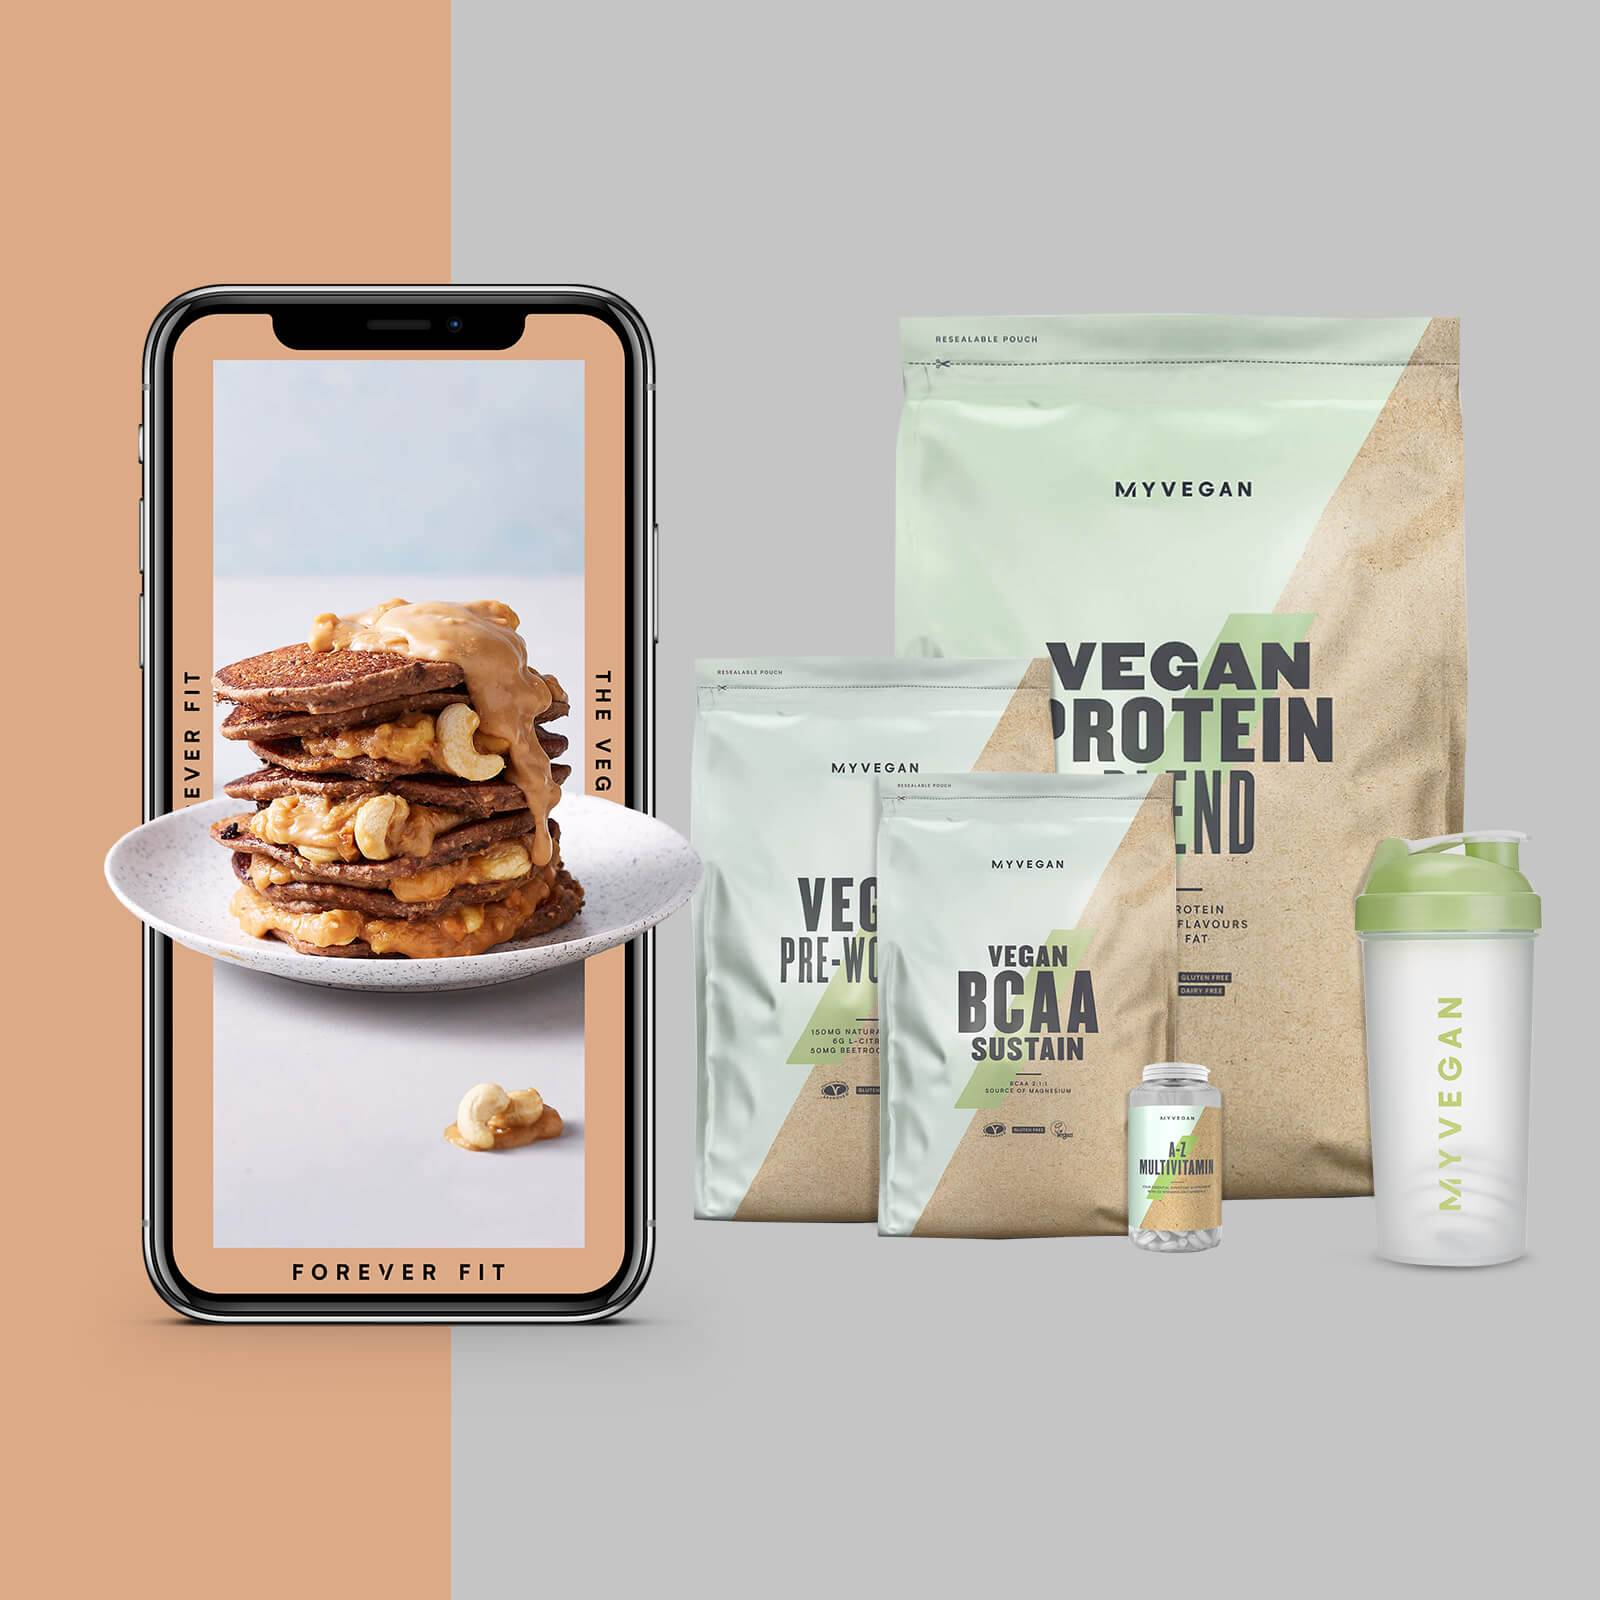 Le Pack Vegan + Guide Entraînement et Nutrition Offert - Raspberry Lemonade - Lemon Tea - Turmeric Latte